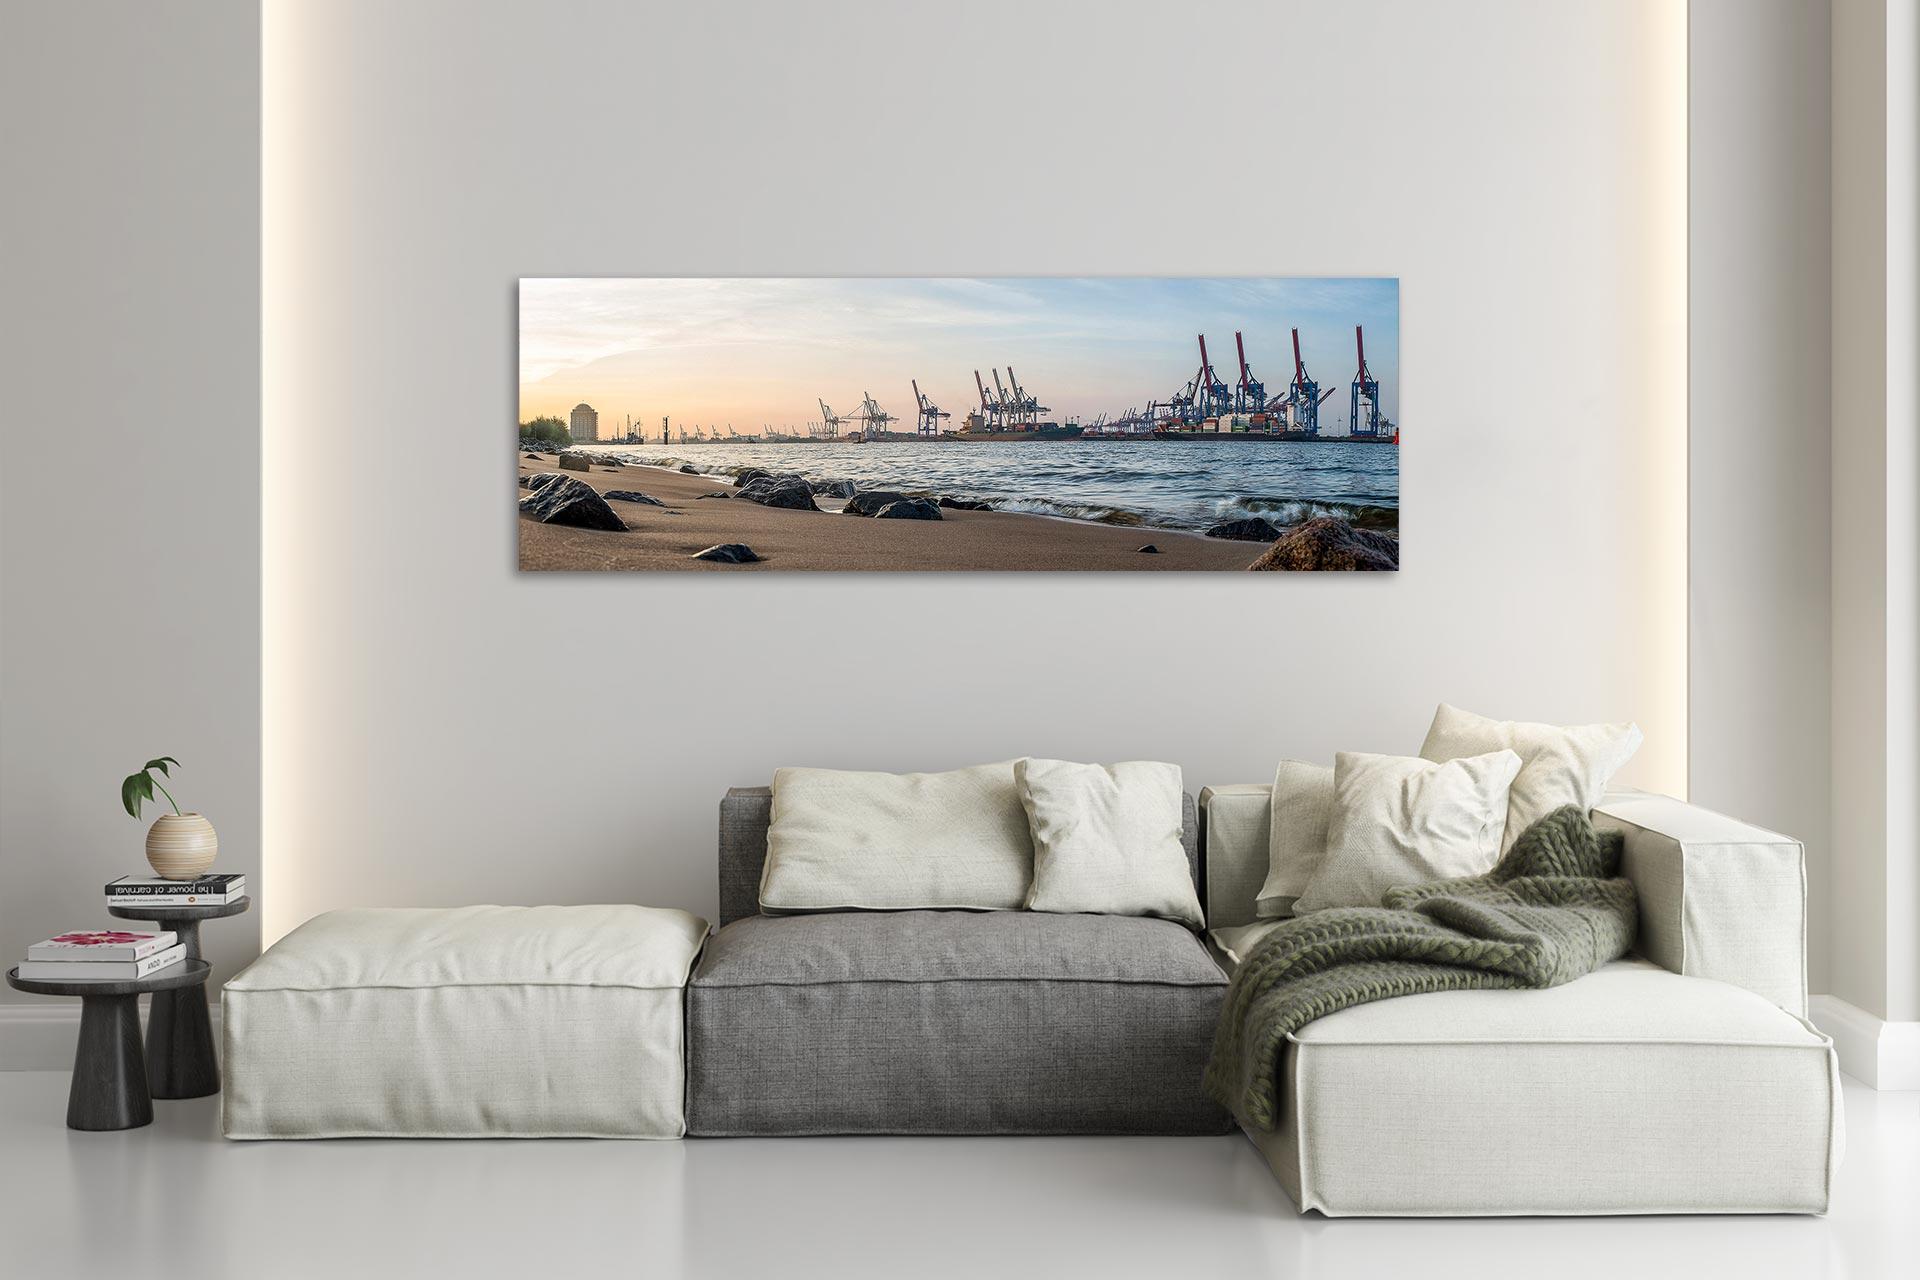 PSW046-panorama-elbstrand-hafen-leinwand-acrylglas-aludibond-wohnzimmer